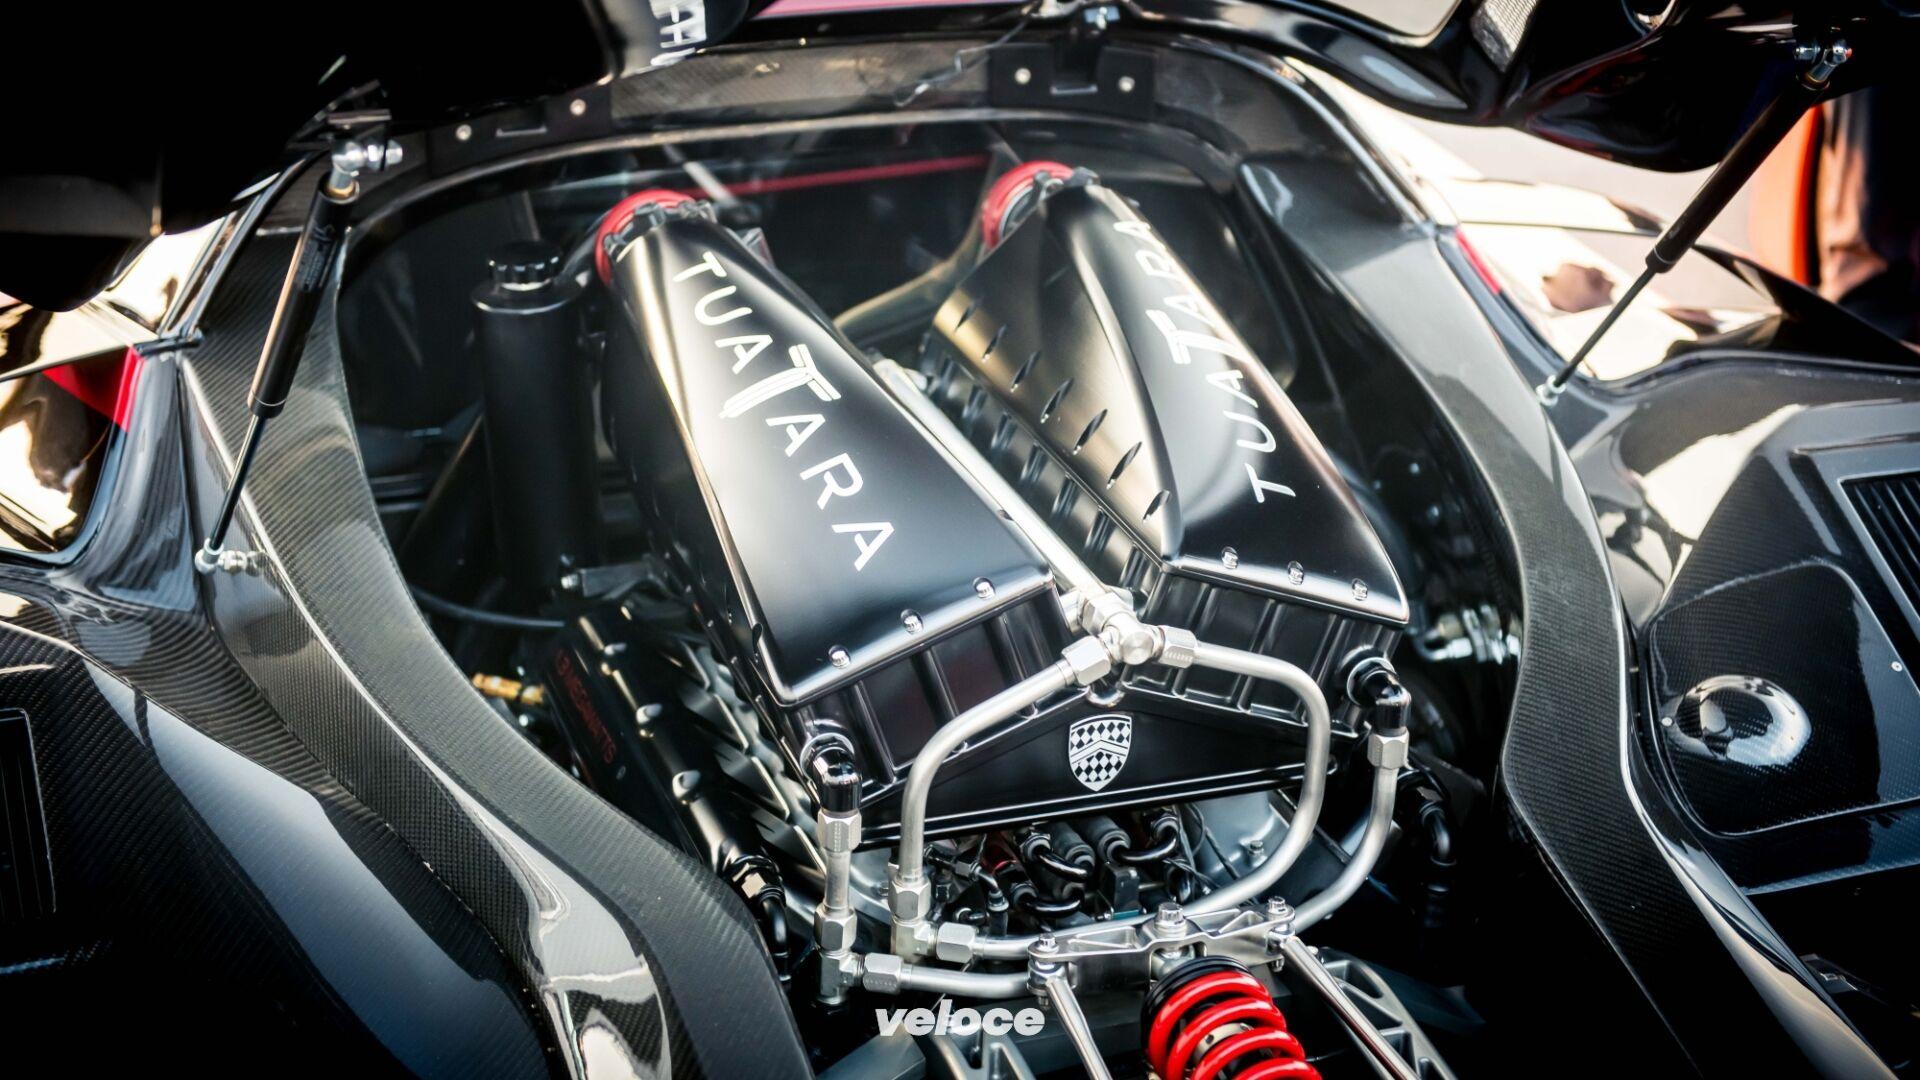 Shelby SSC Tuatara 2020 SSC-Tuatara-record-di-velocità-533-kmh-3-1920x1080